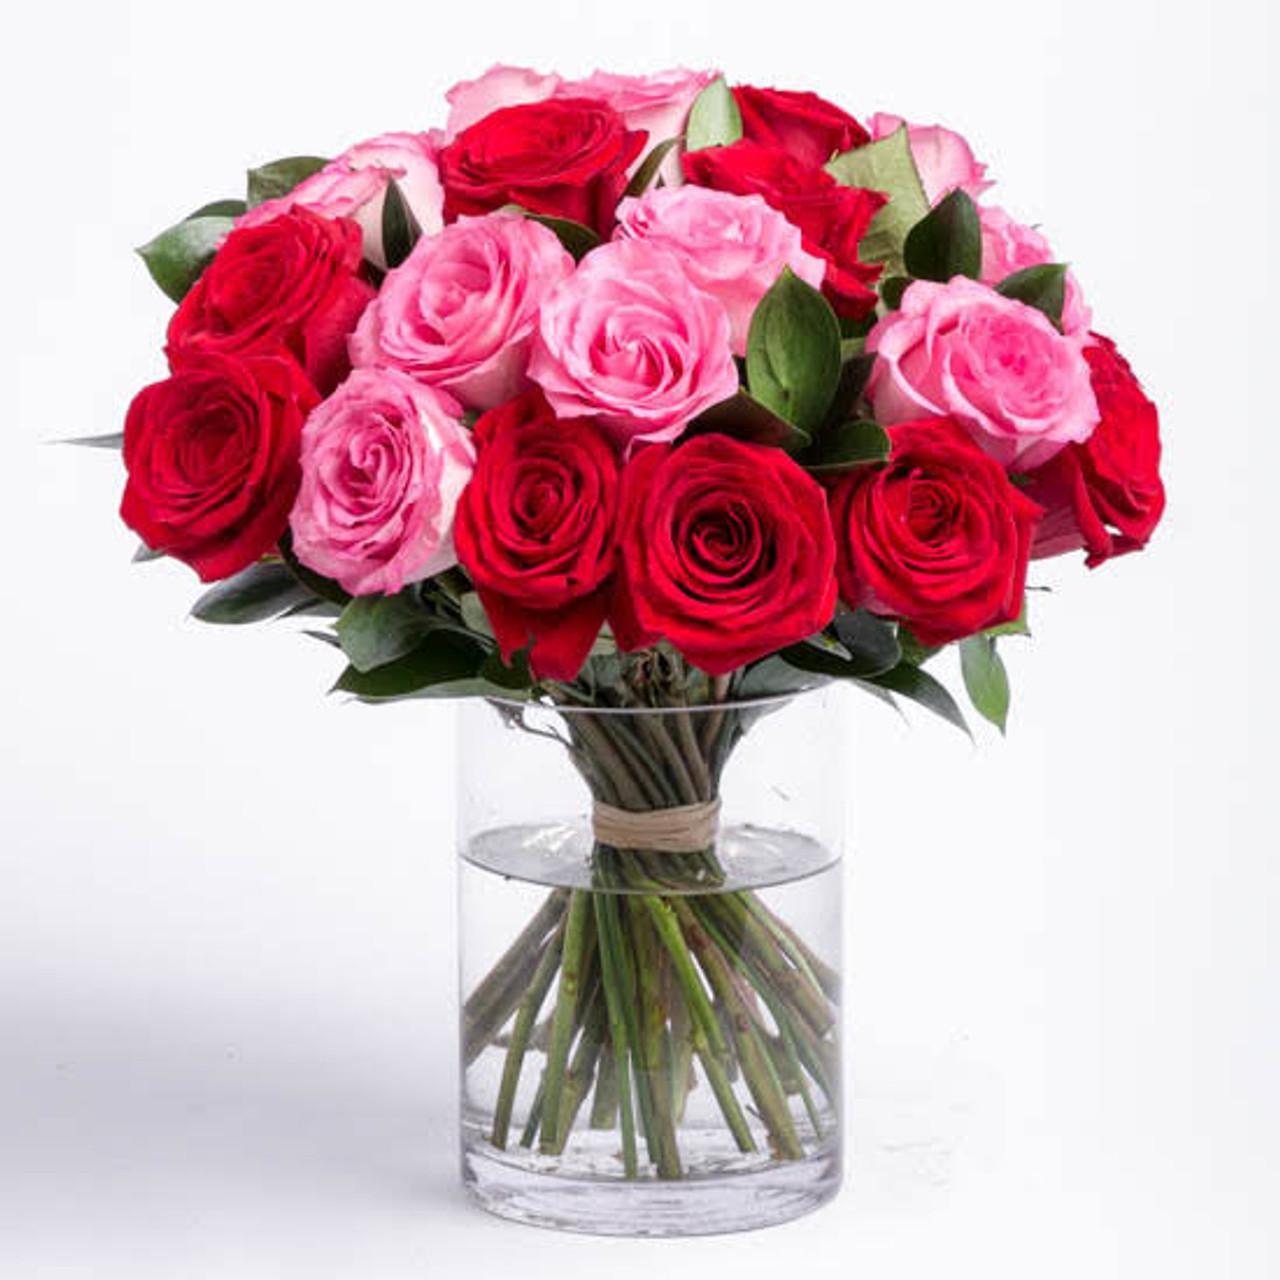 Pink & Red Luxury Ecuadorian Roses